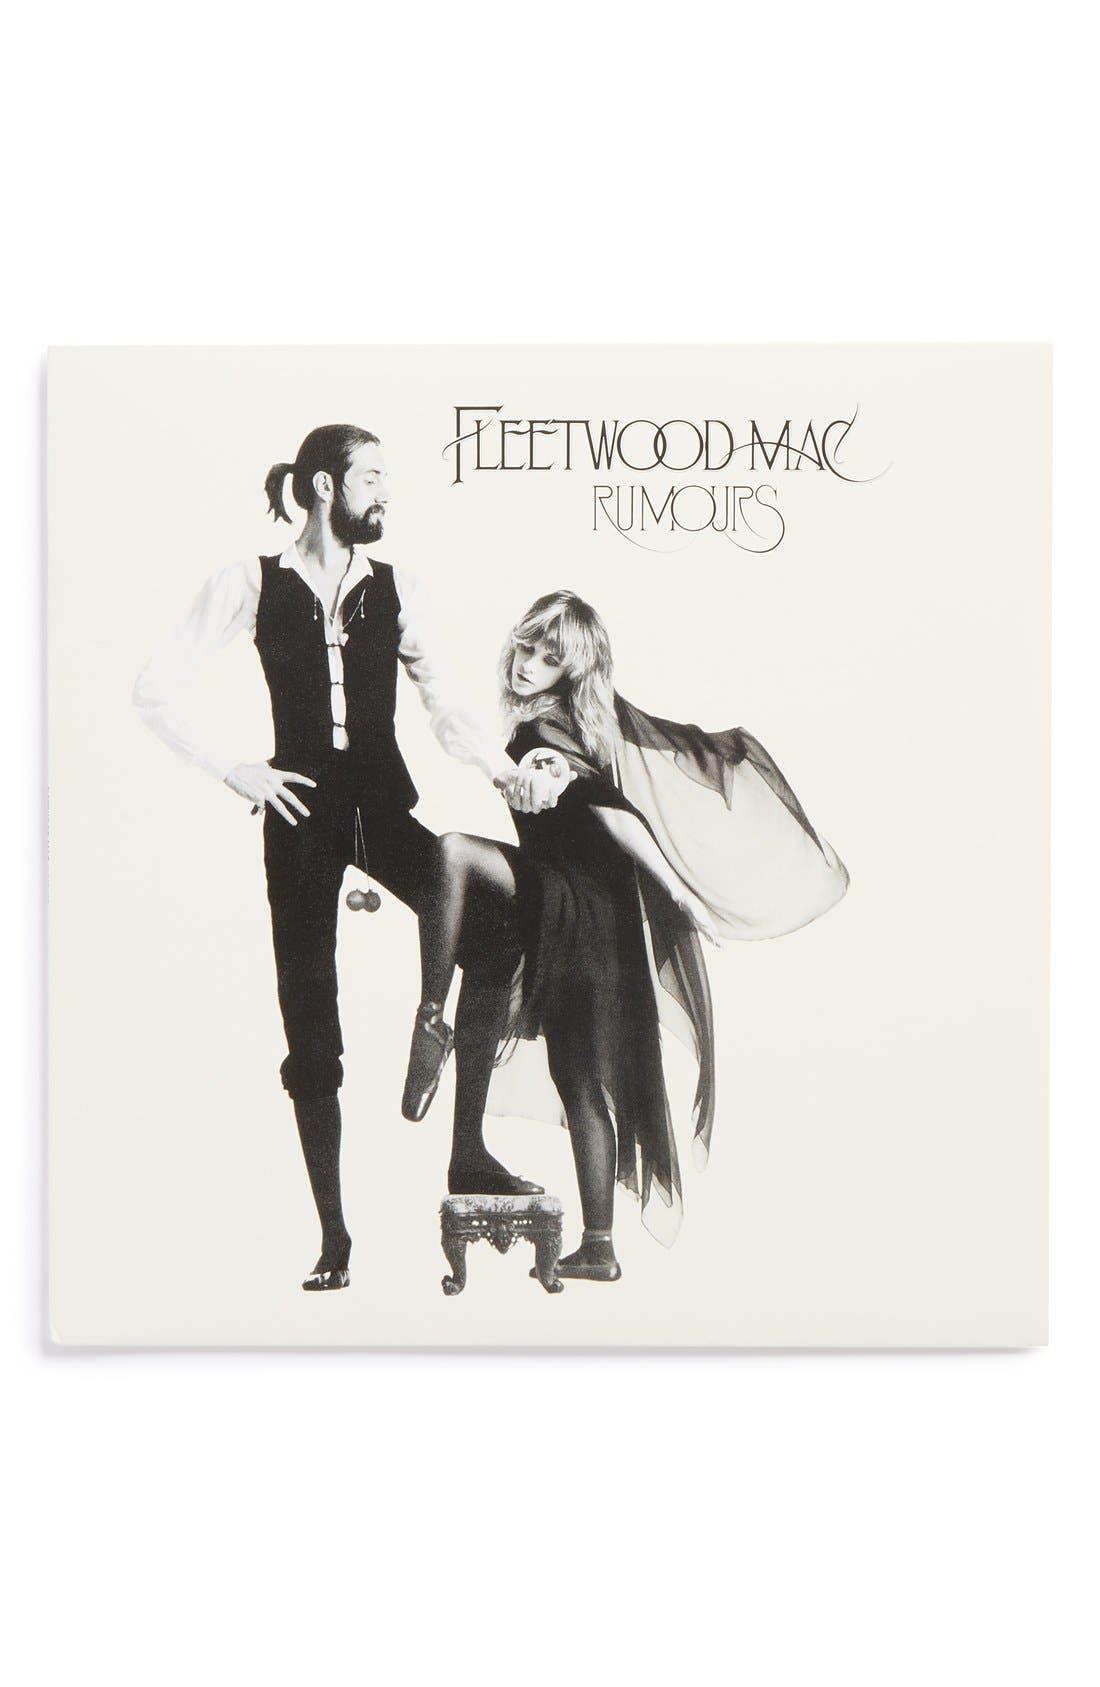 Fleetwood Mac 'Rumours' LP Vinyl Record,                         Main,                         color, Black